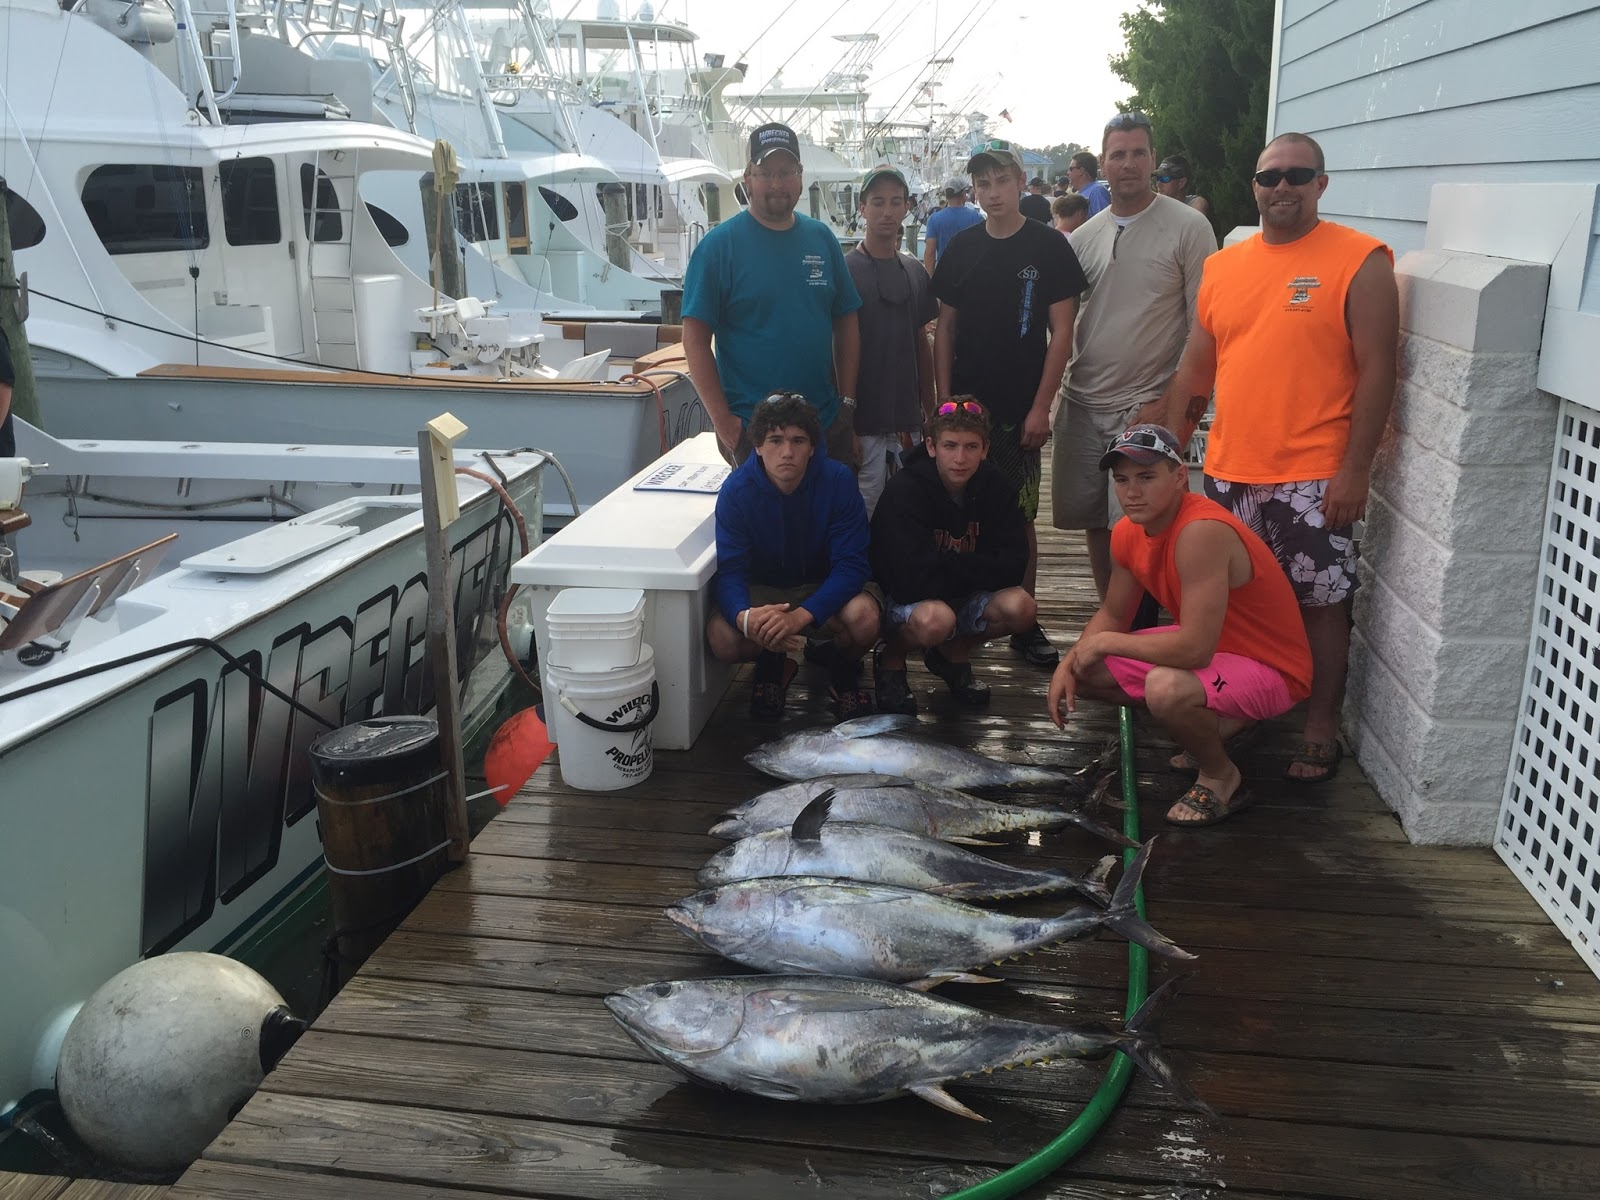 June 13 2015 daily reports news ocean city fishing center for Ocean city fishing center